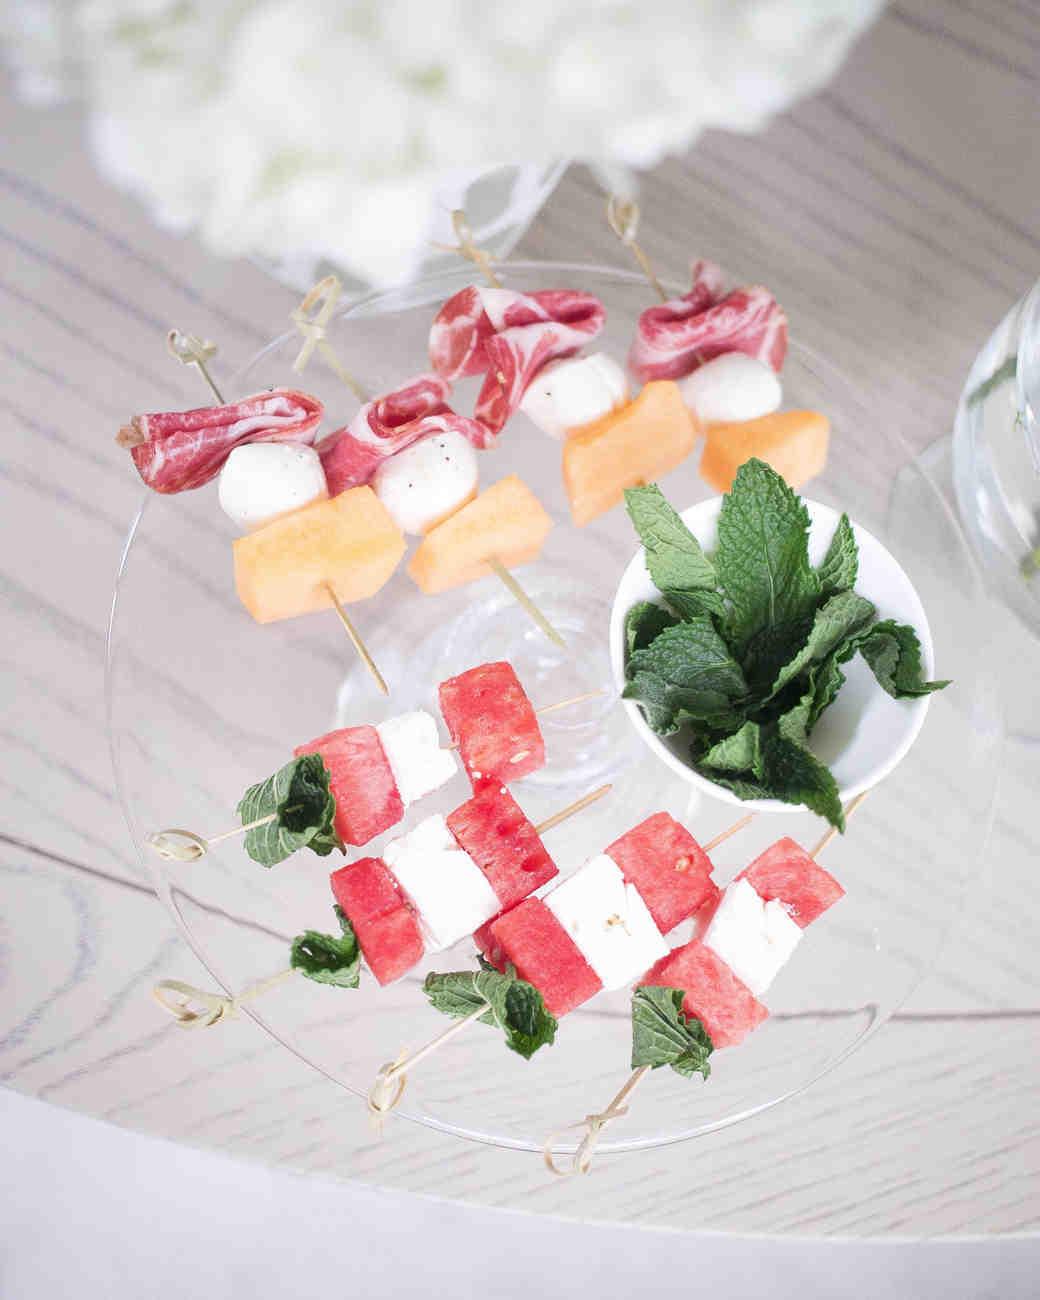 fashionable-hostess-bridal-shower-melon-kebabs-0416.jpg